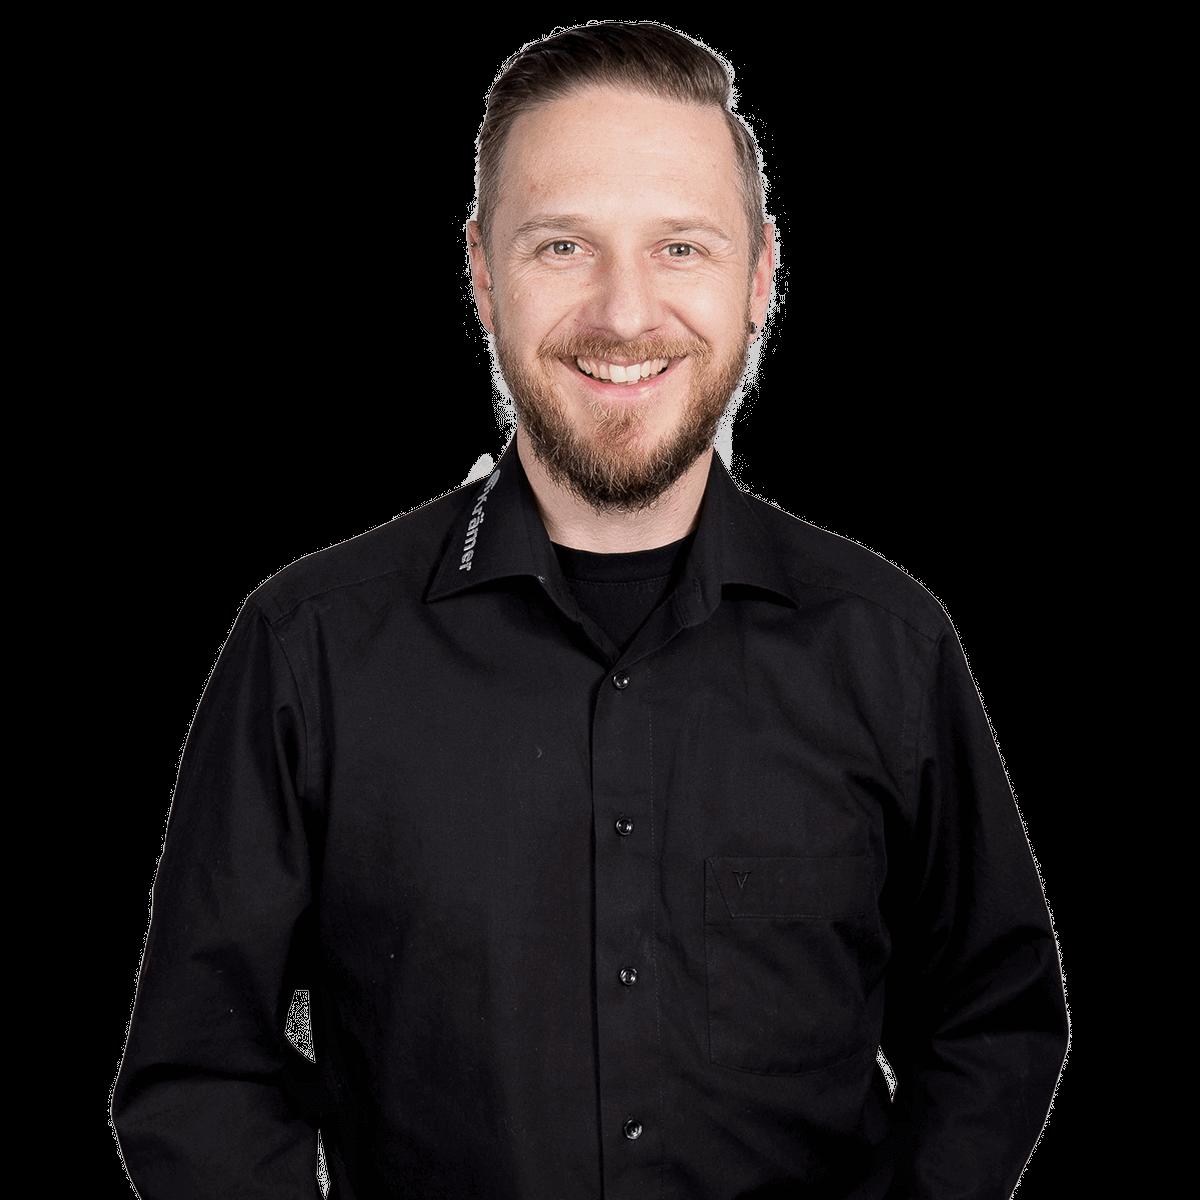 IT Cloud Shop Vertriebsmitarbeiter Stefan Müller